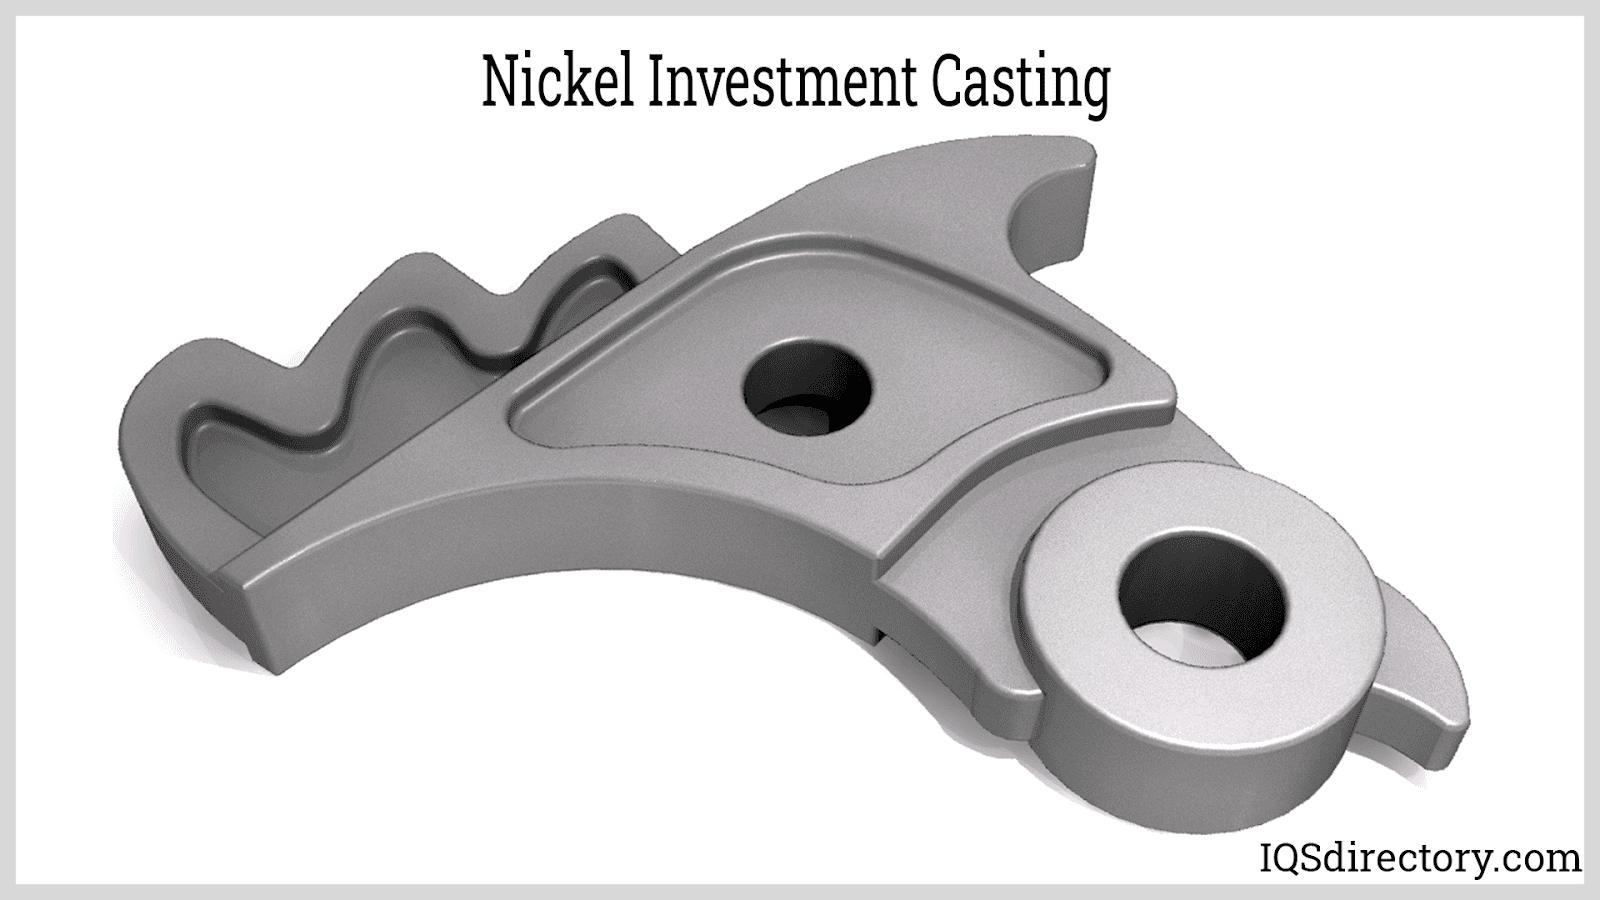 Nickel Investment Casting